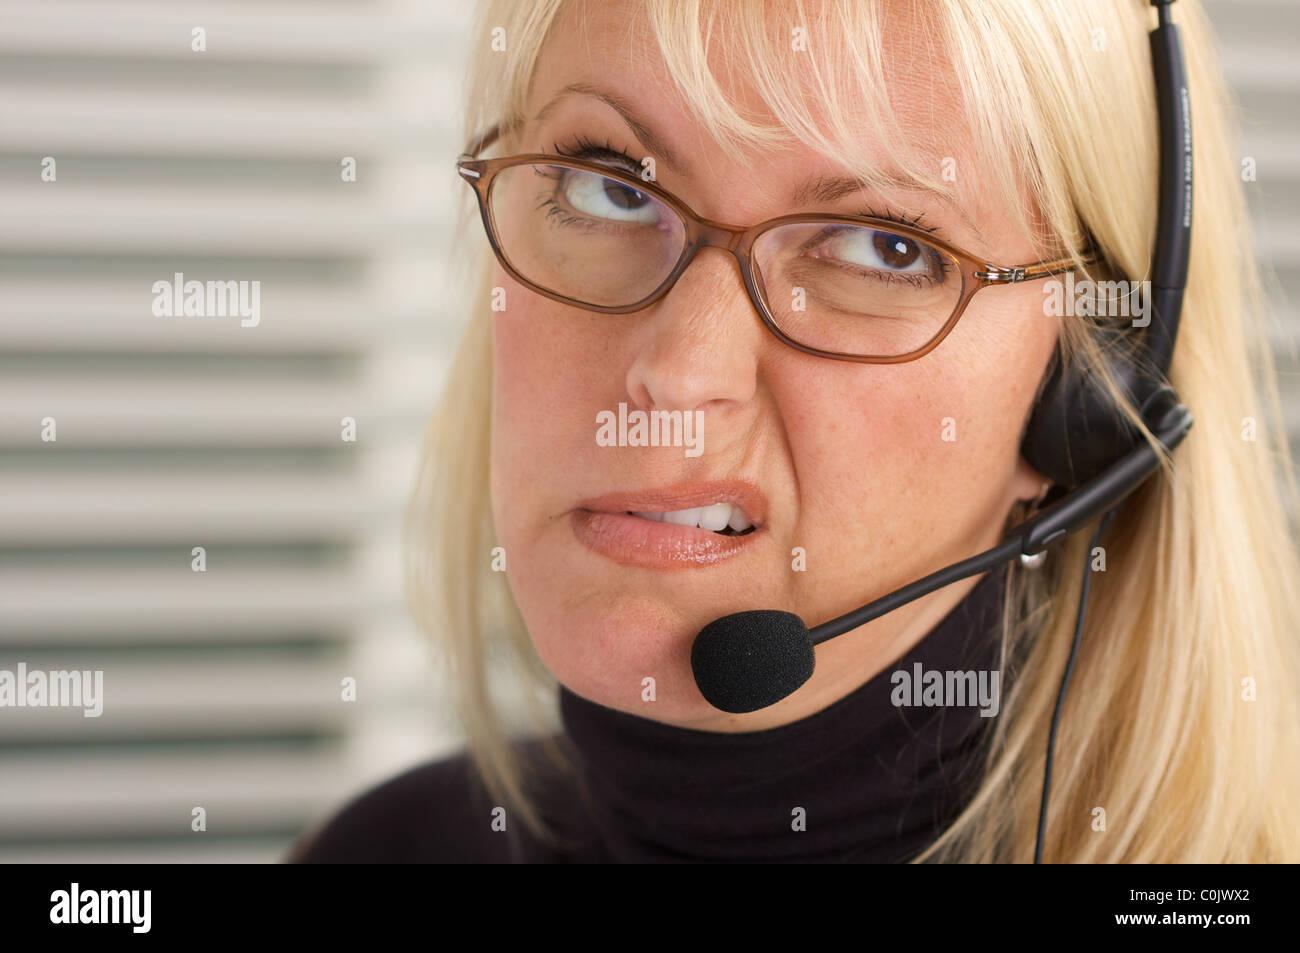 Disgruntled businesswoman talks on her phone headset. - Stock Image